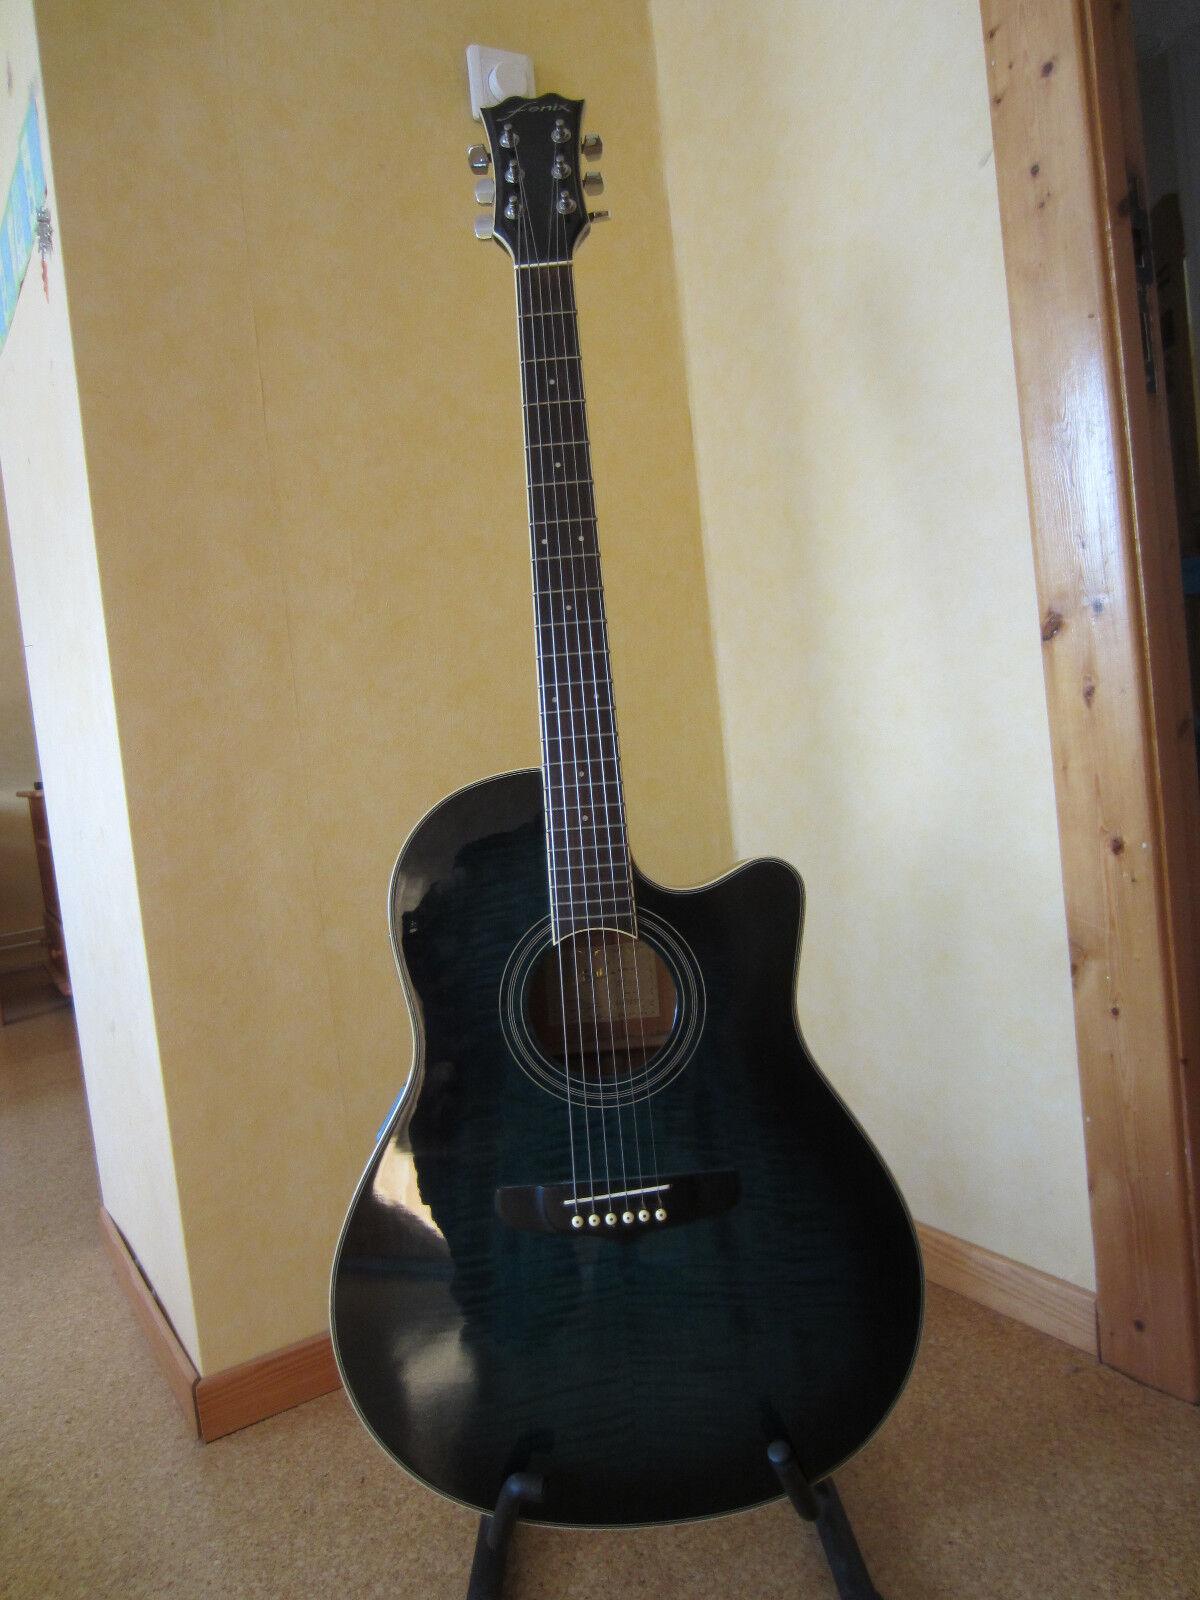 Fenix SL90 by Young Chang elektro-akustische Gitarre, Guter Zustand